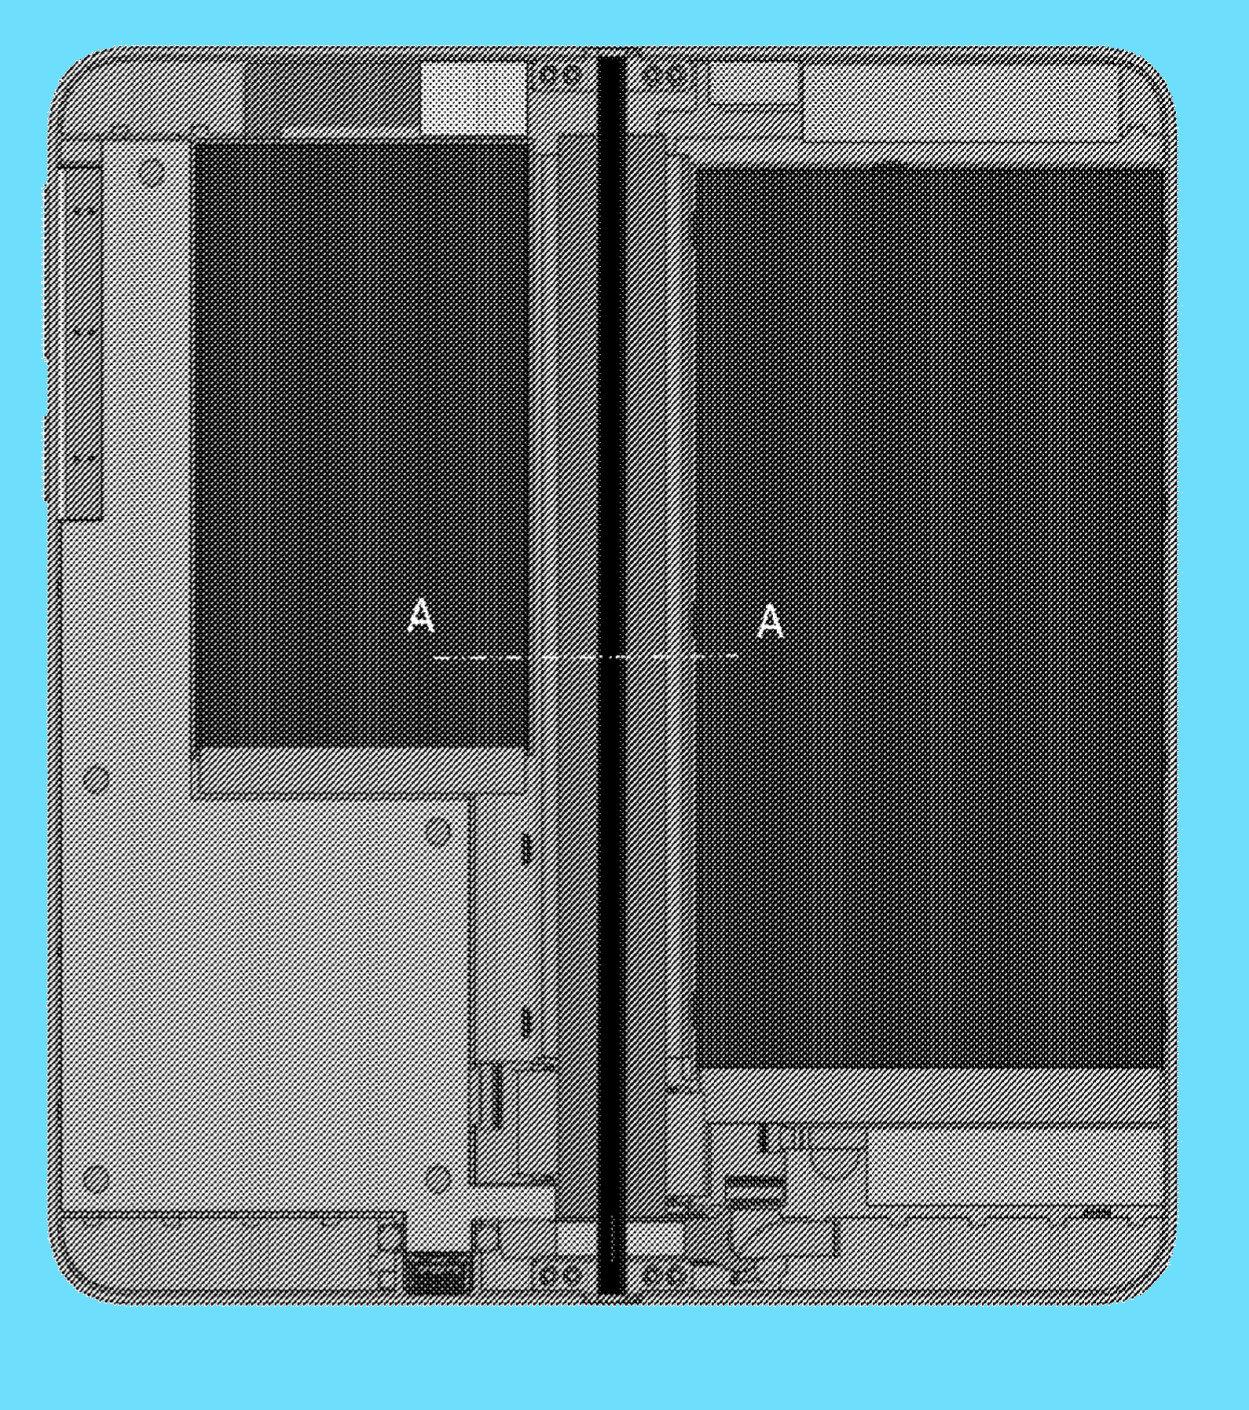 Otra patente para un Surface Phone plegable con doble pantalla OLED 38